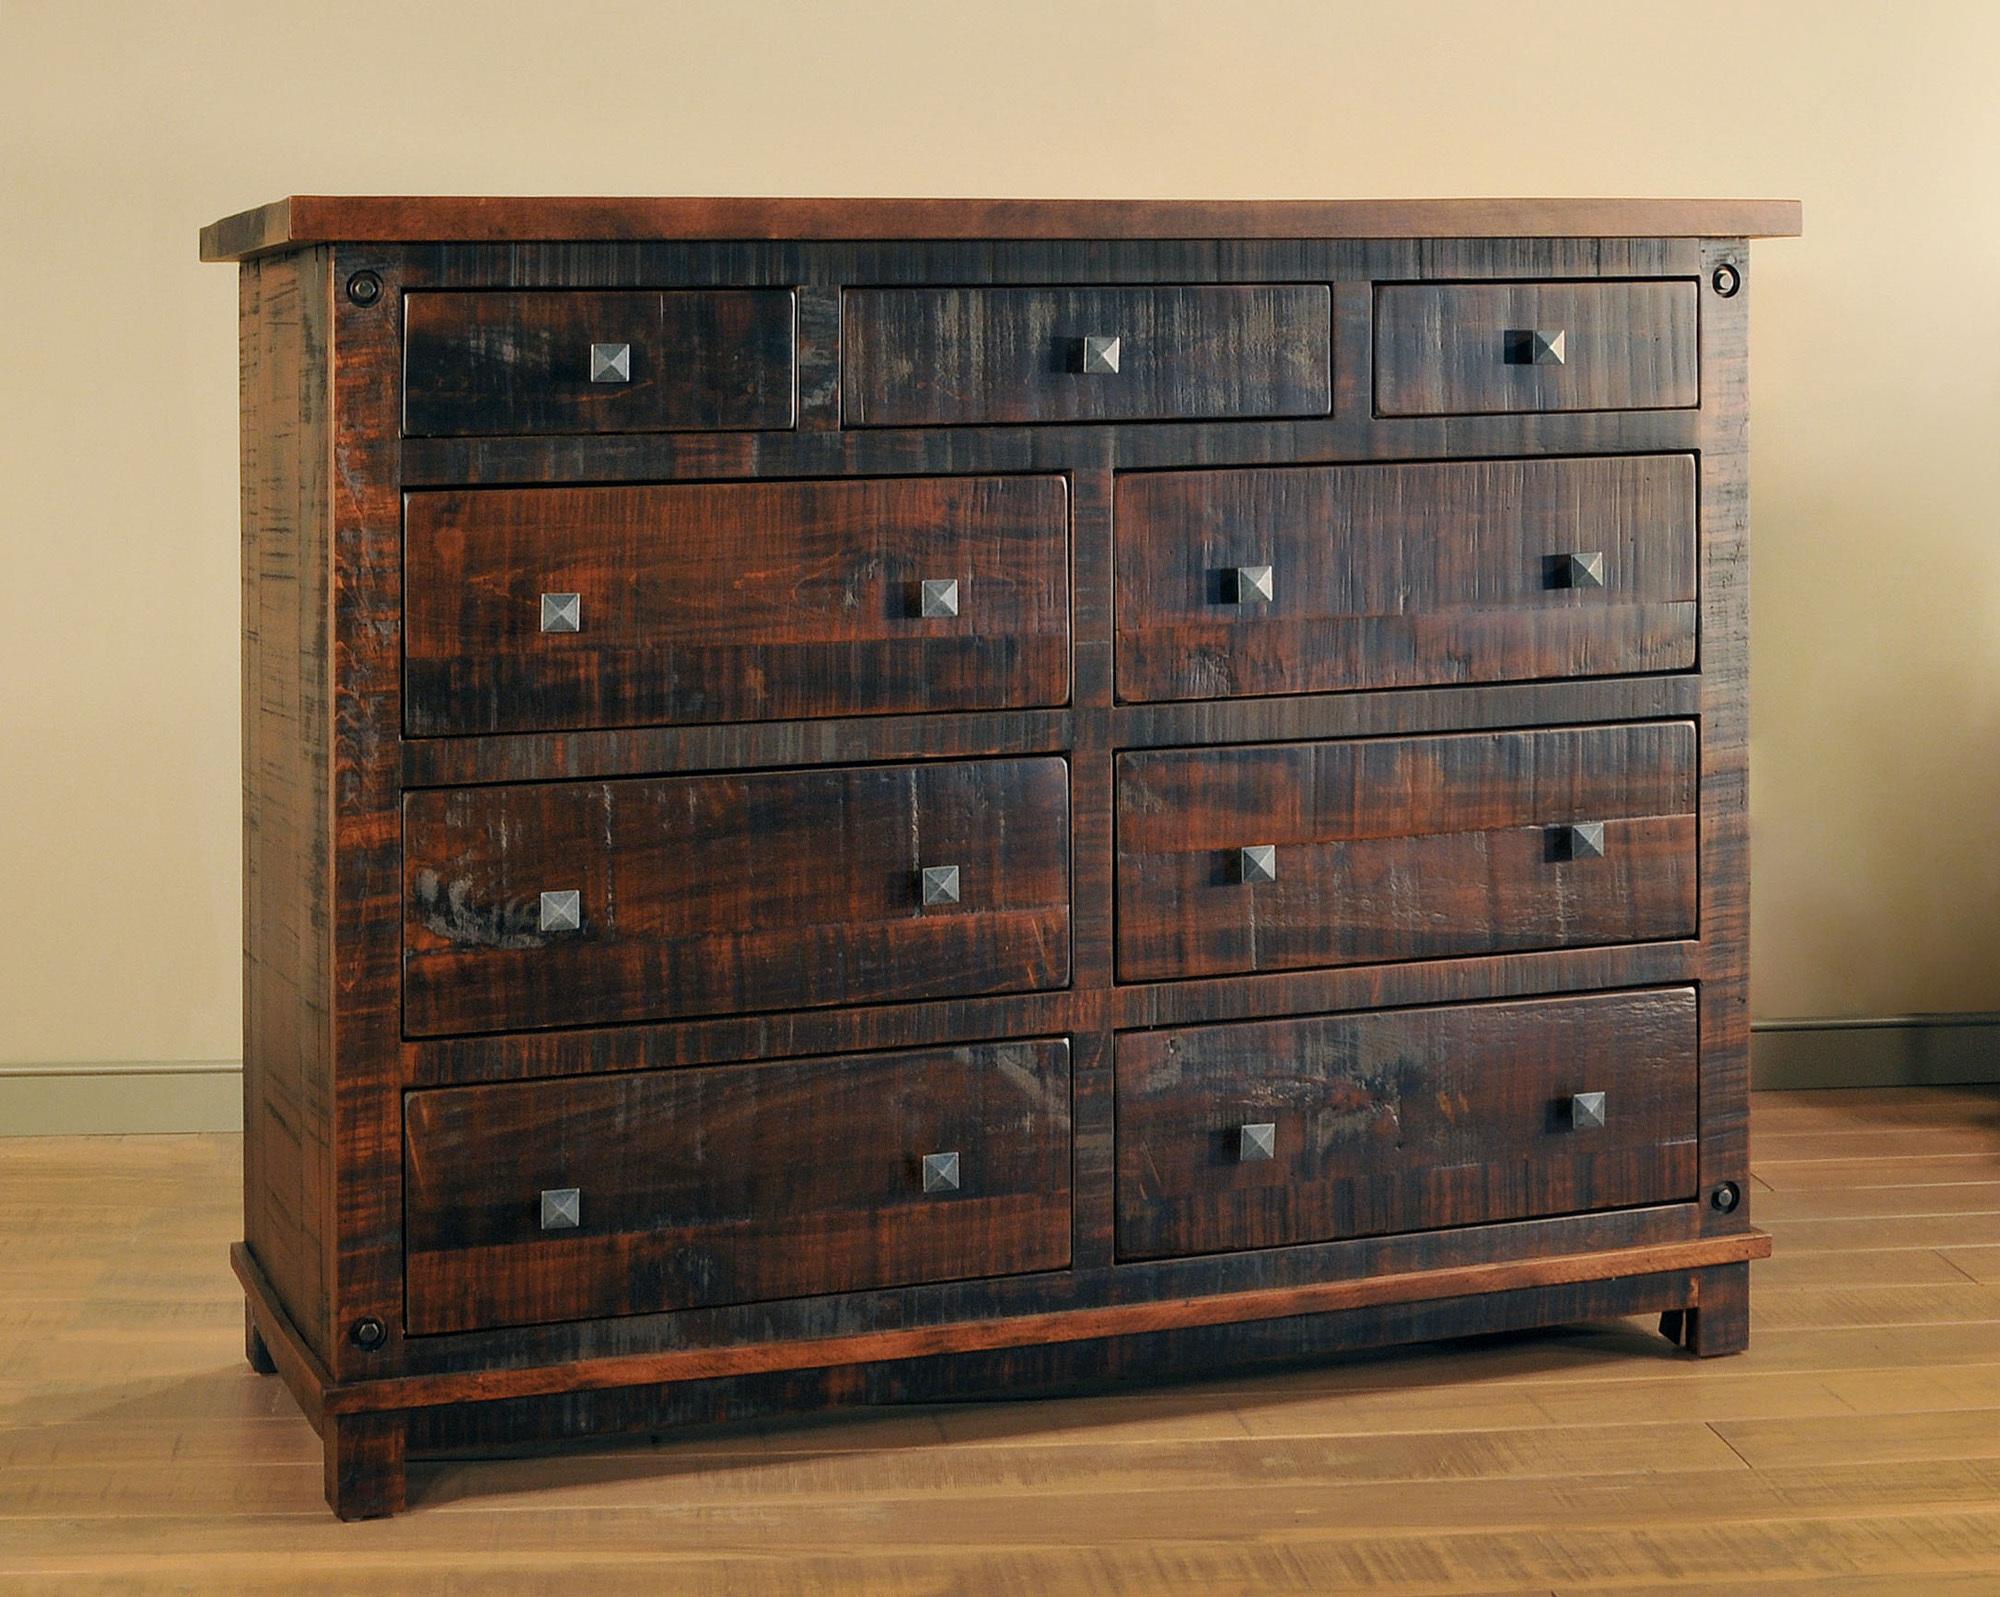 Muskoka Dresser by Ruff Sawn mkkd4356